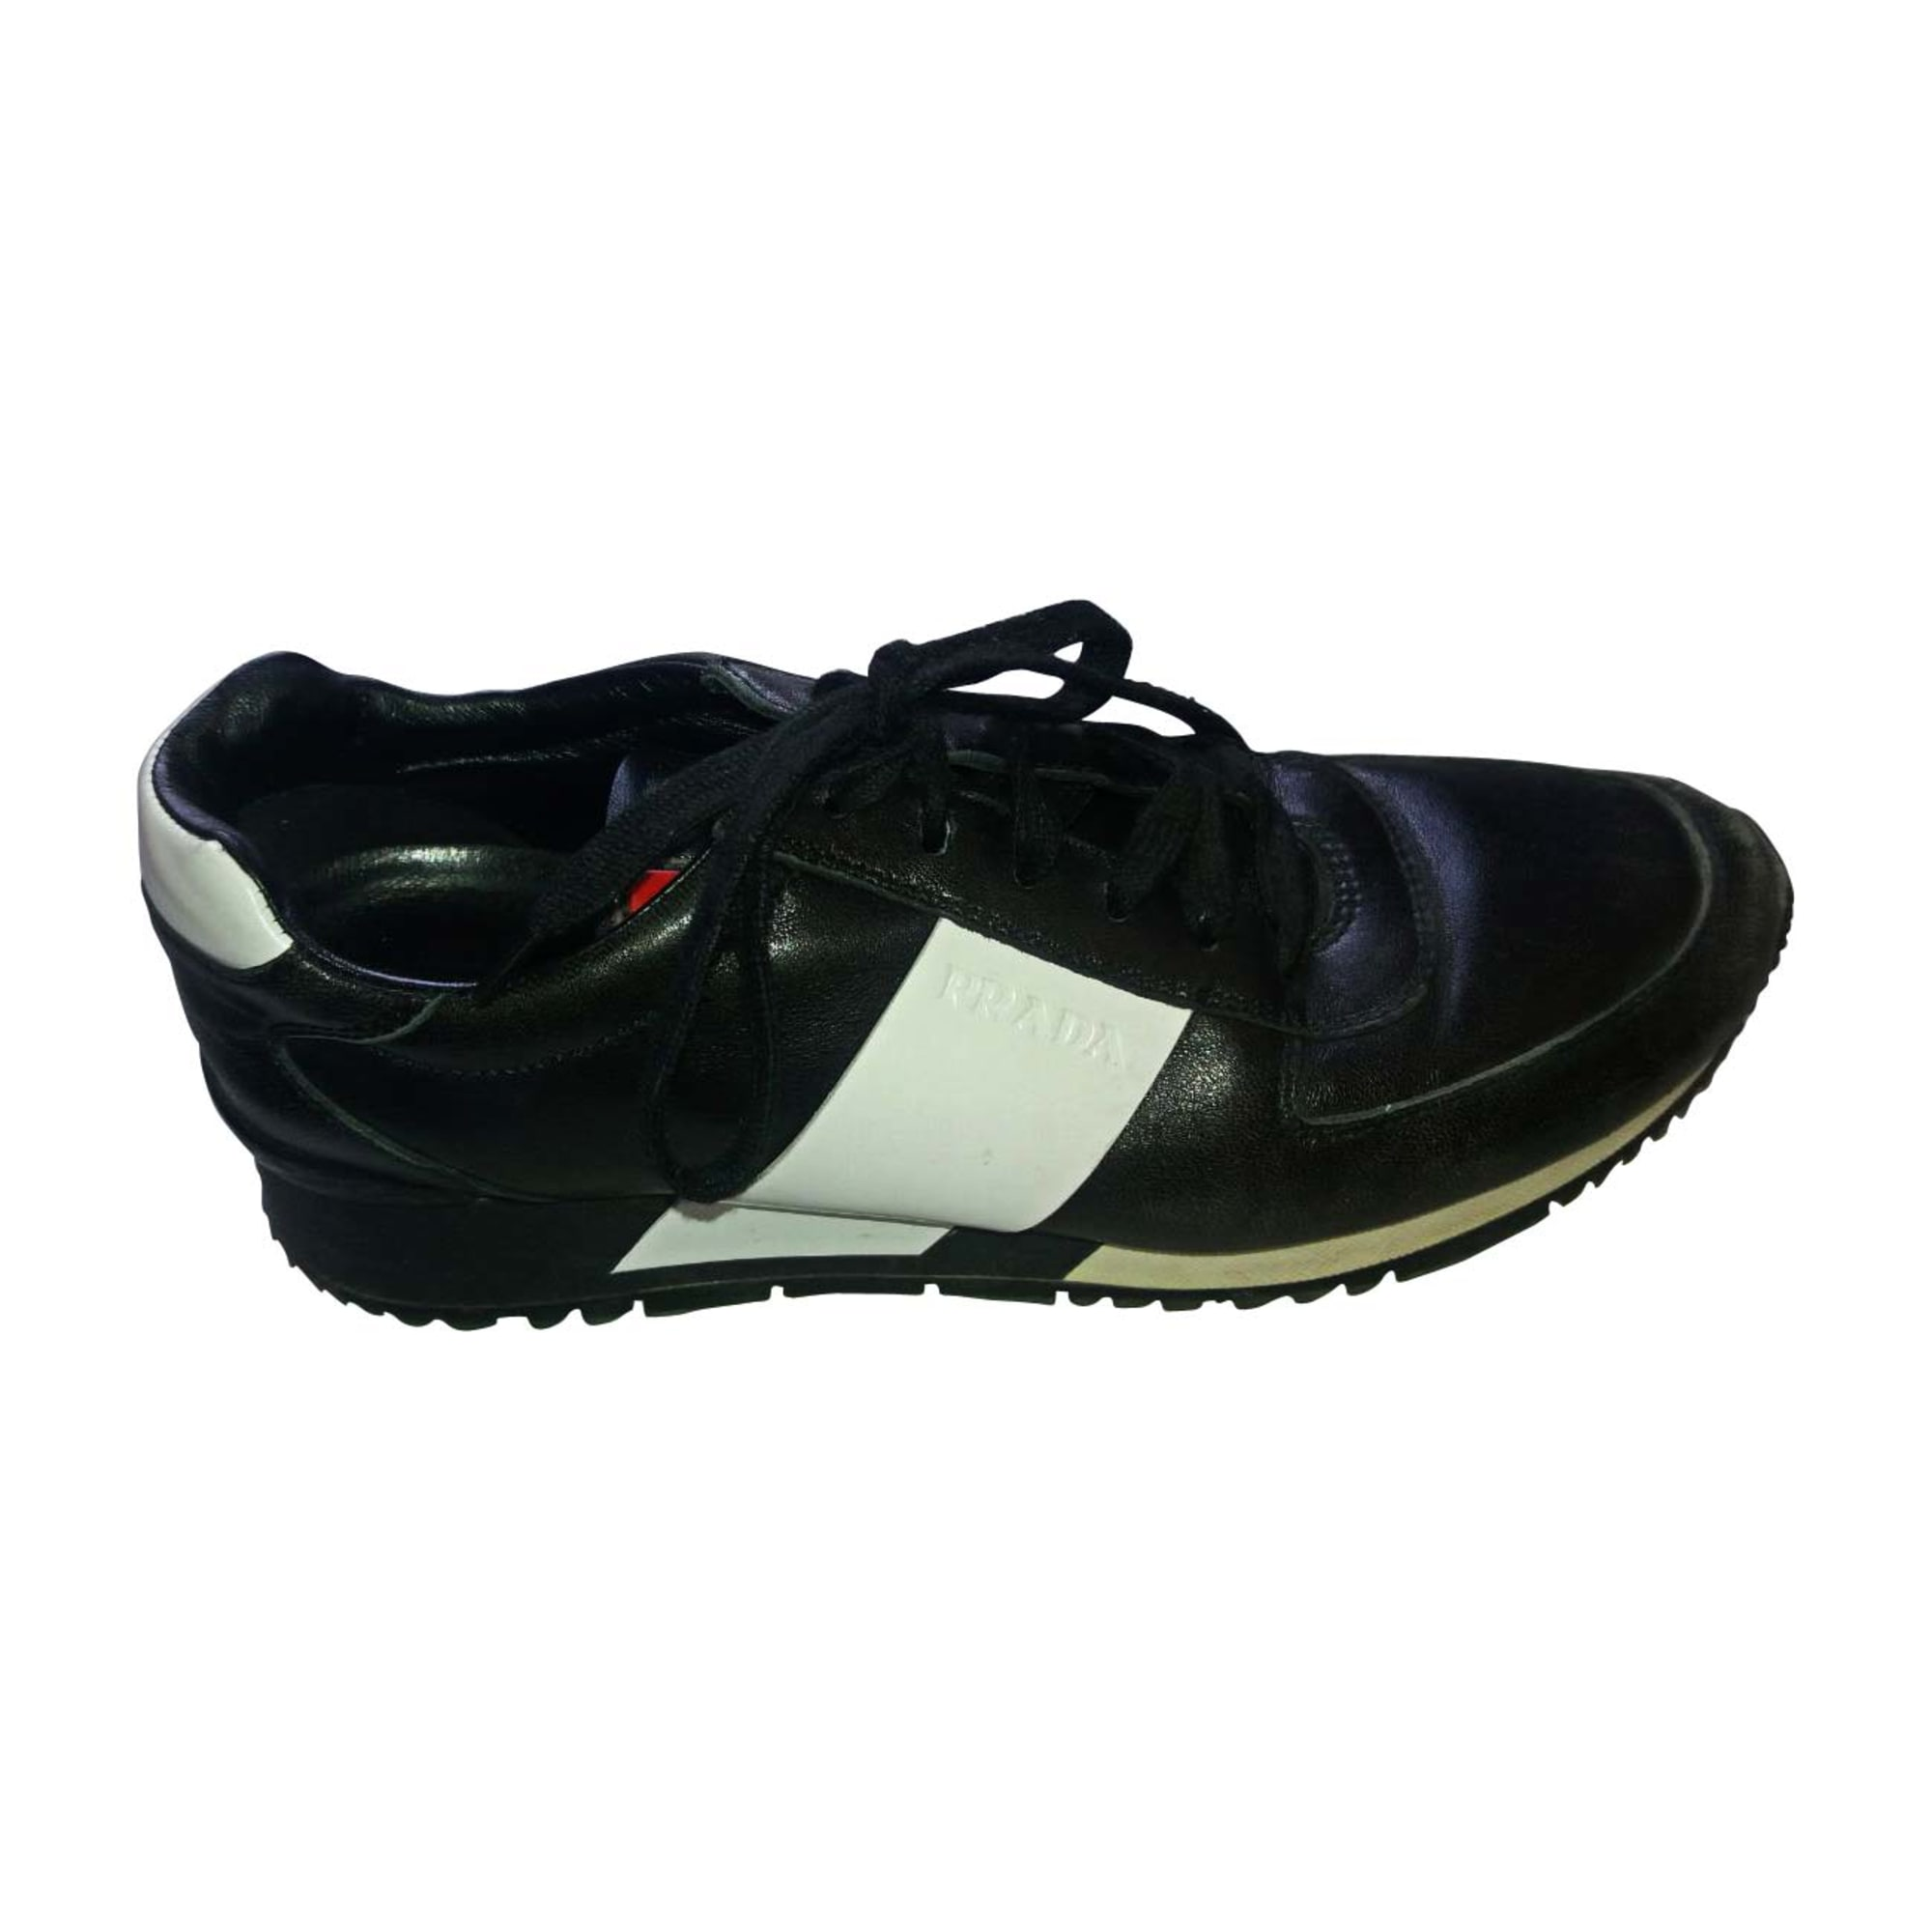 39 Blanc De 7855460 Noir Wti1iv Sport Et Prada Chaussures wvSaCqXx